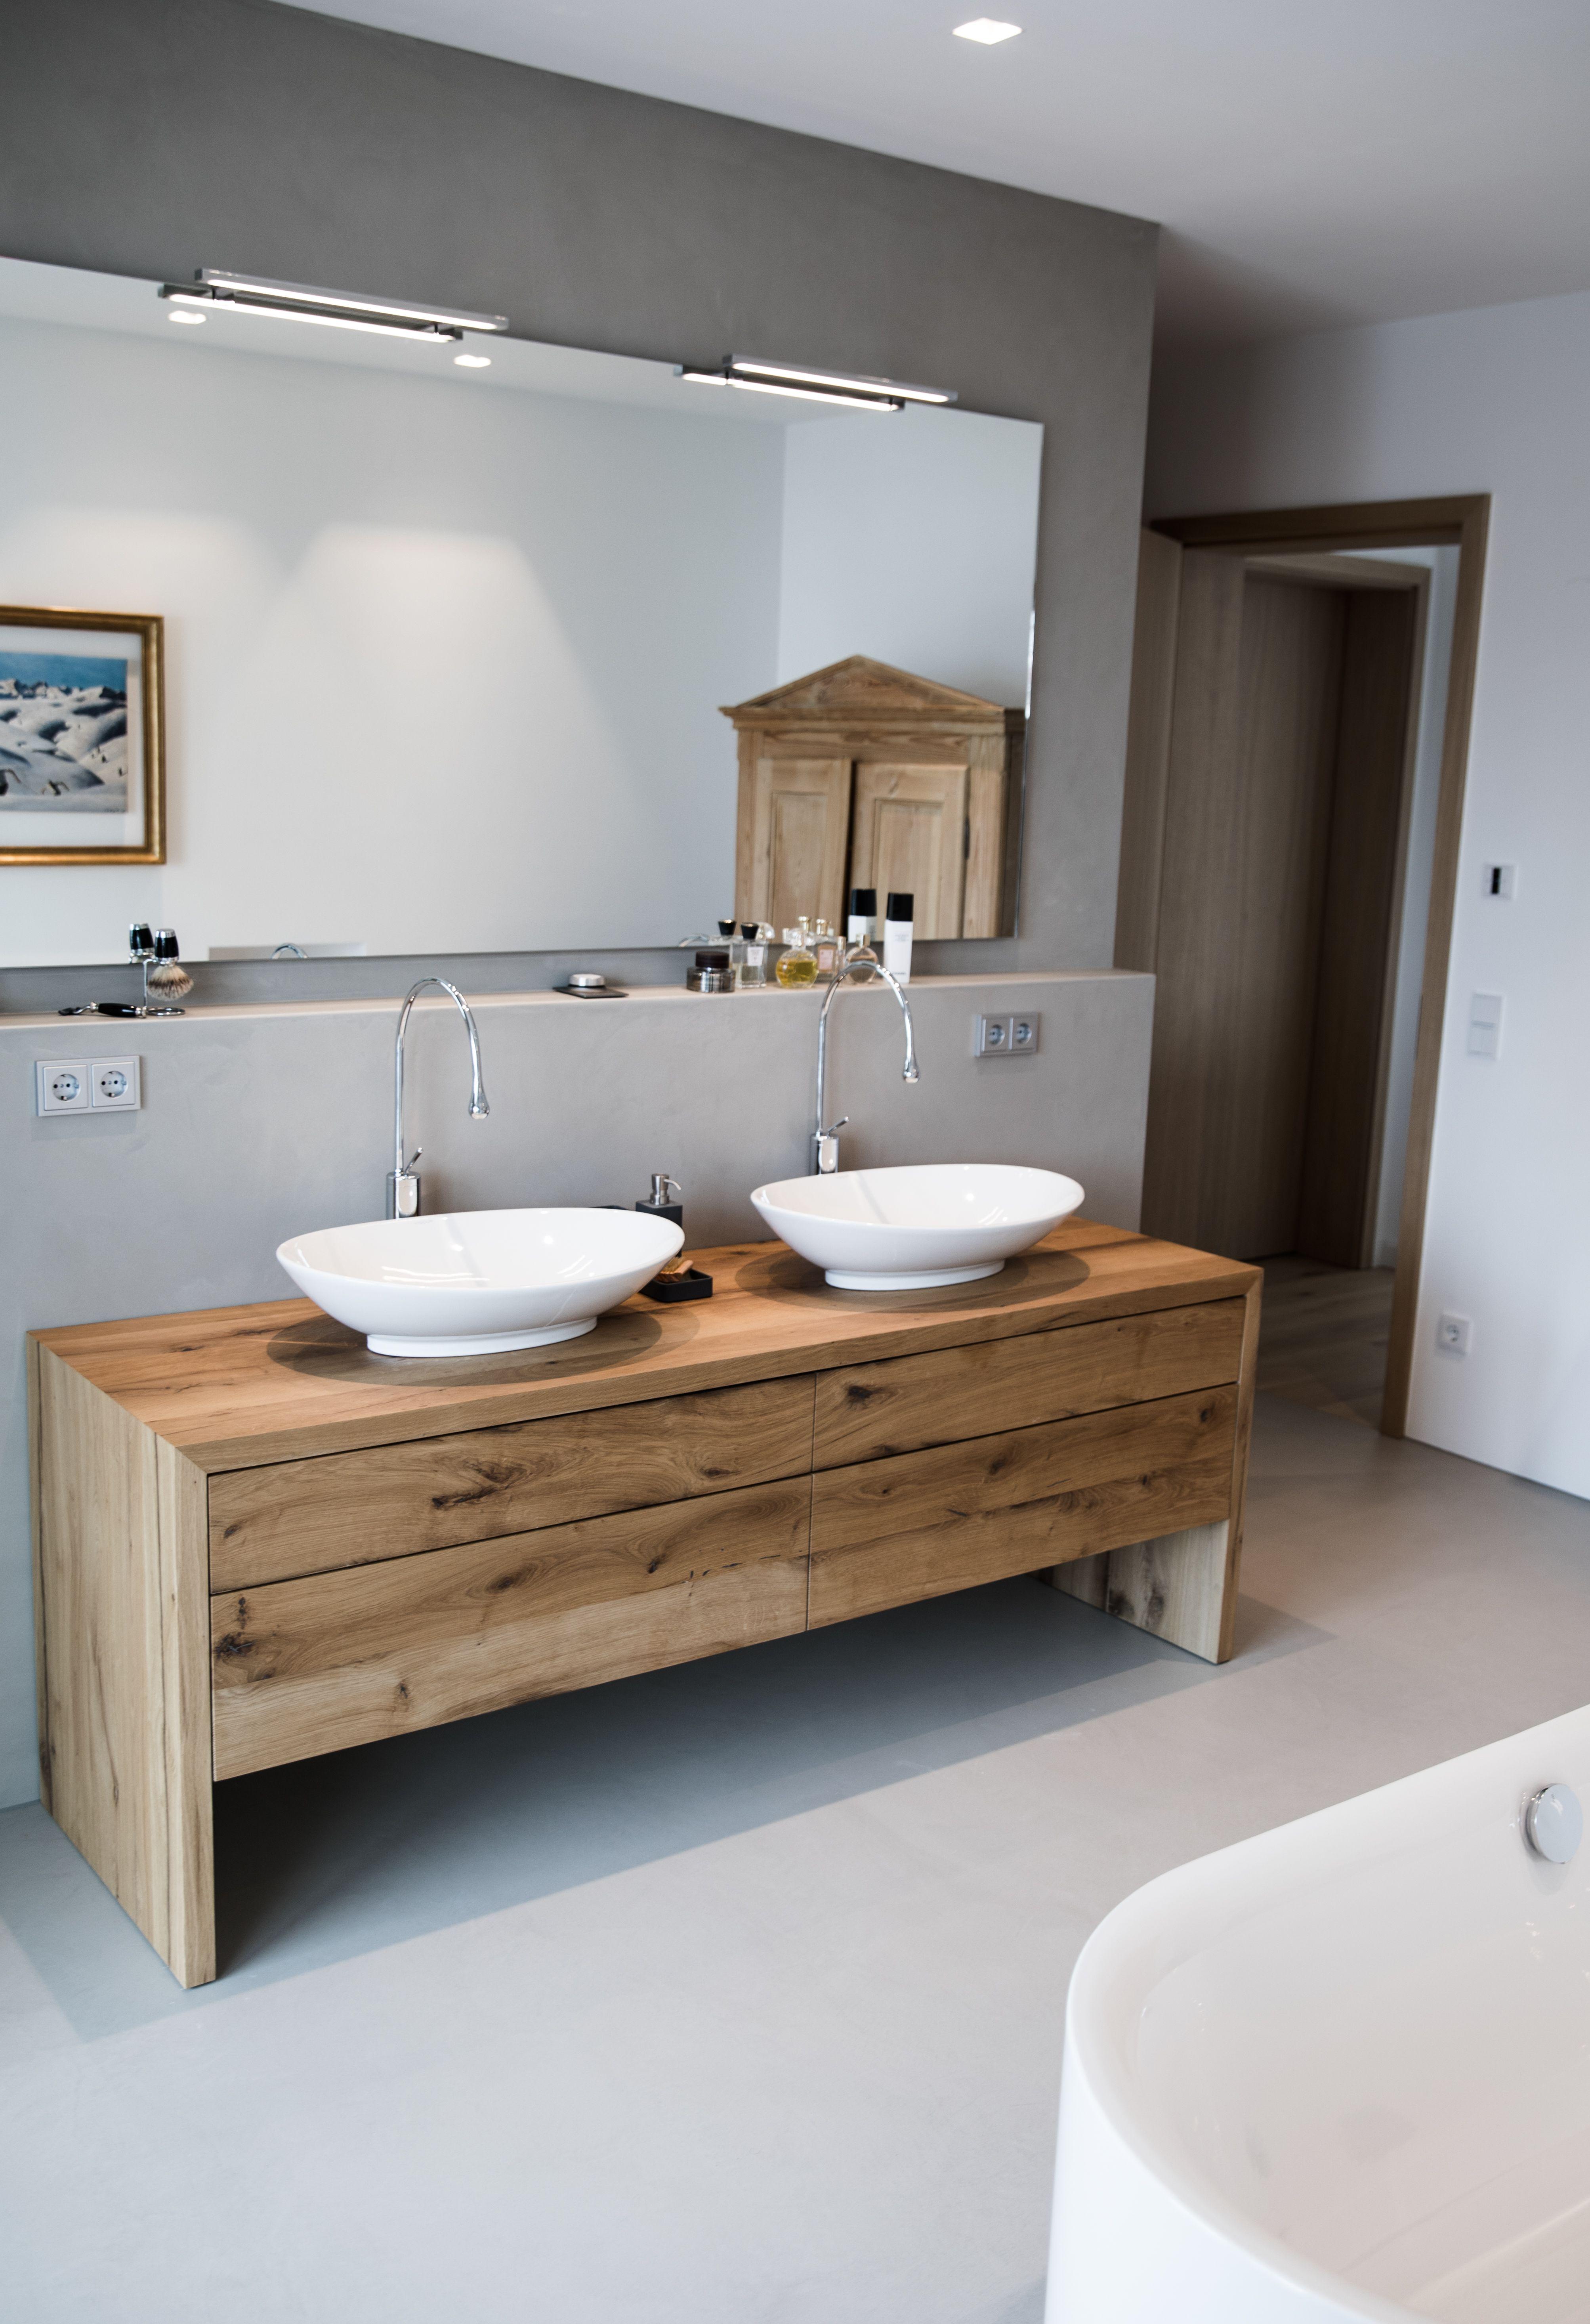 Badezimmerboden Designboden | Badezimmer | Pinterest ...